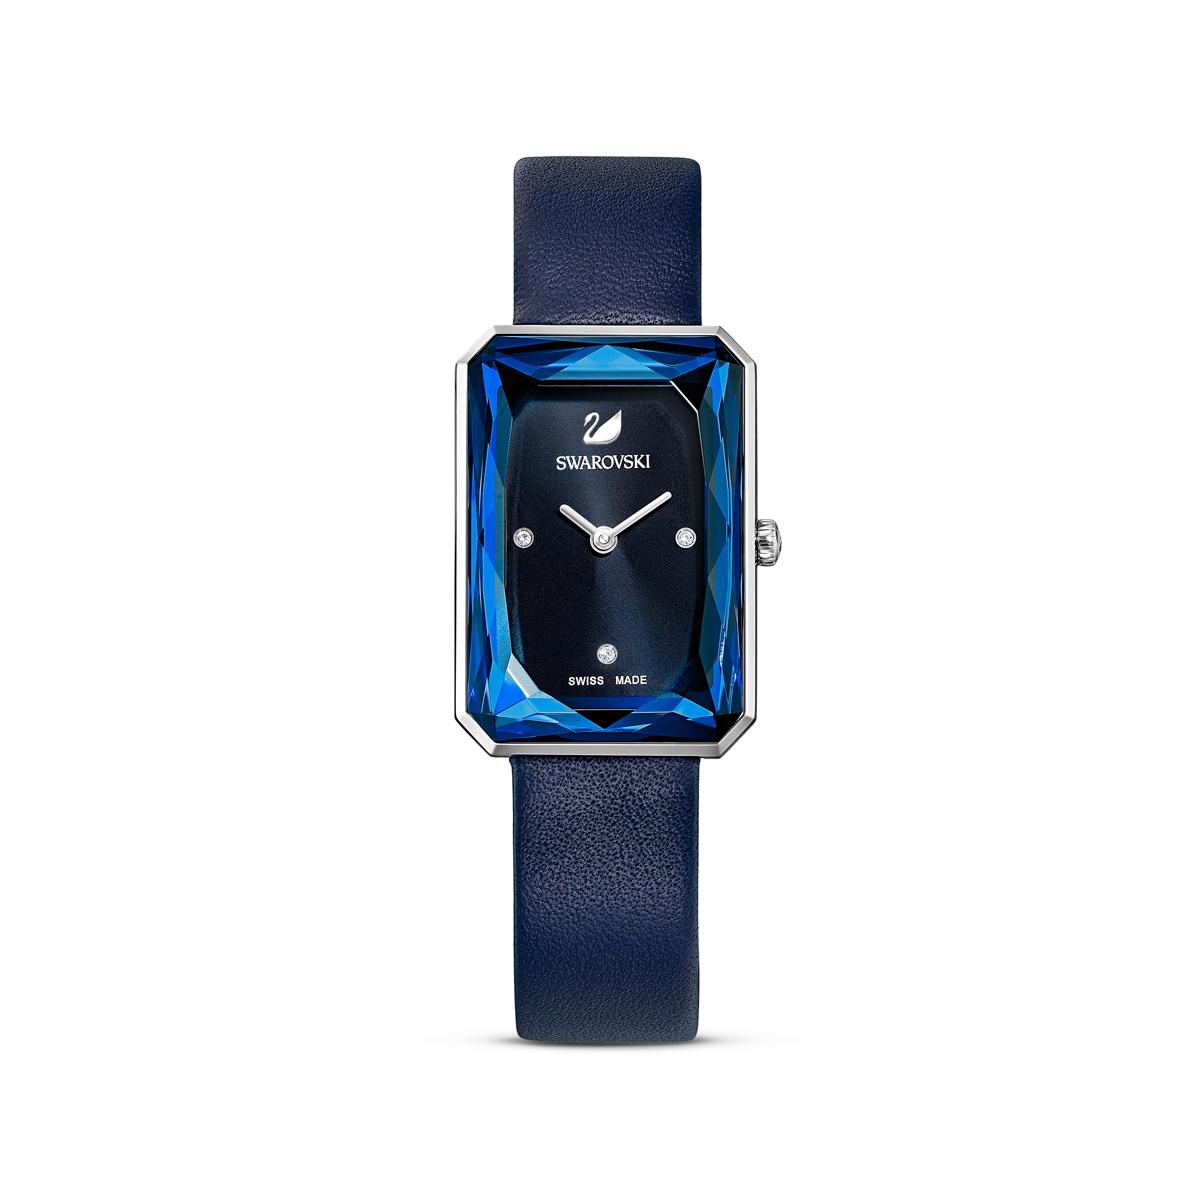 Swarovski Uptown Watch, Leather Strap, Blue, Stainless Steel